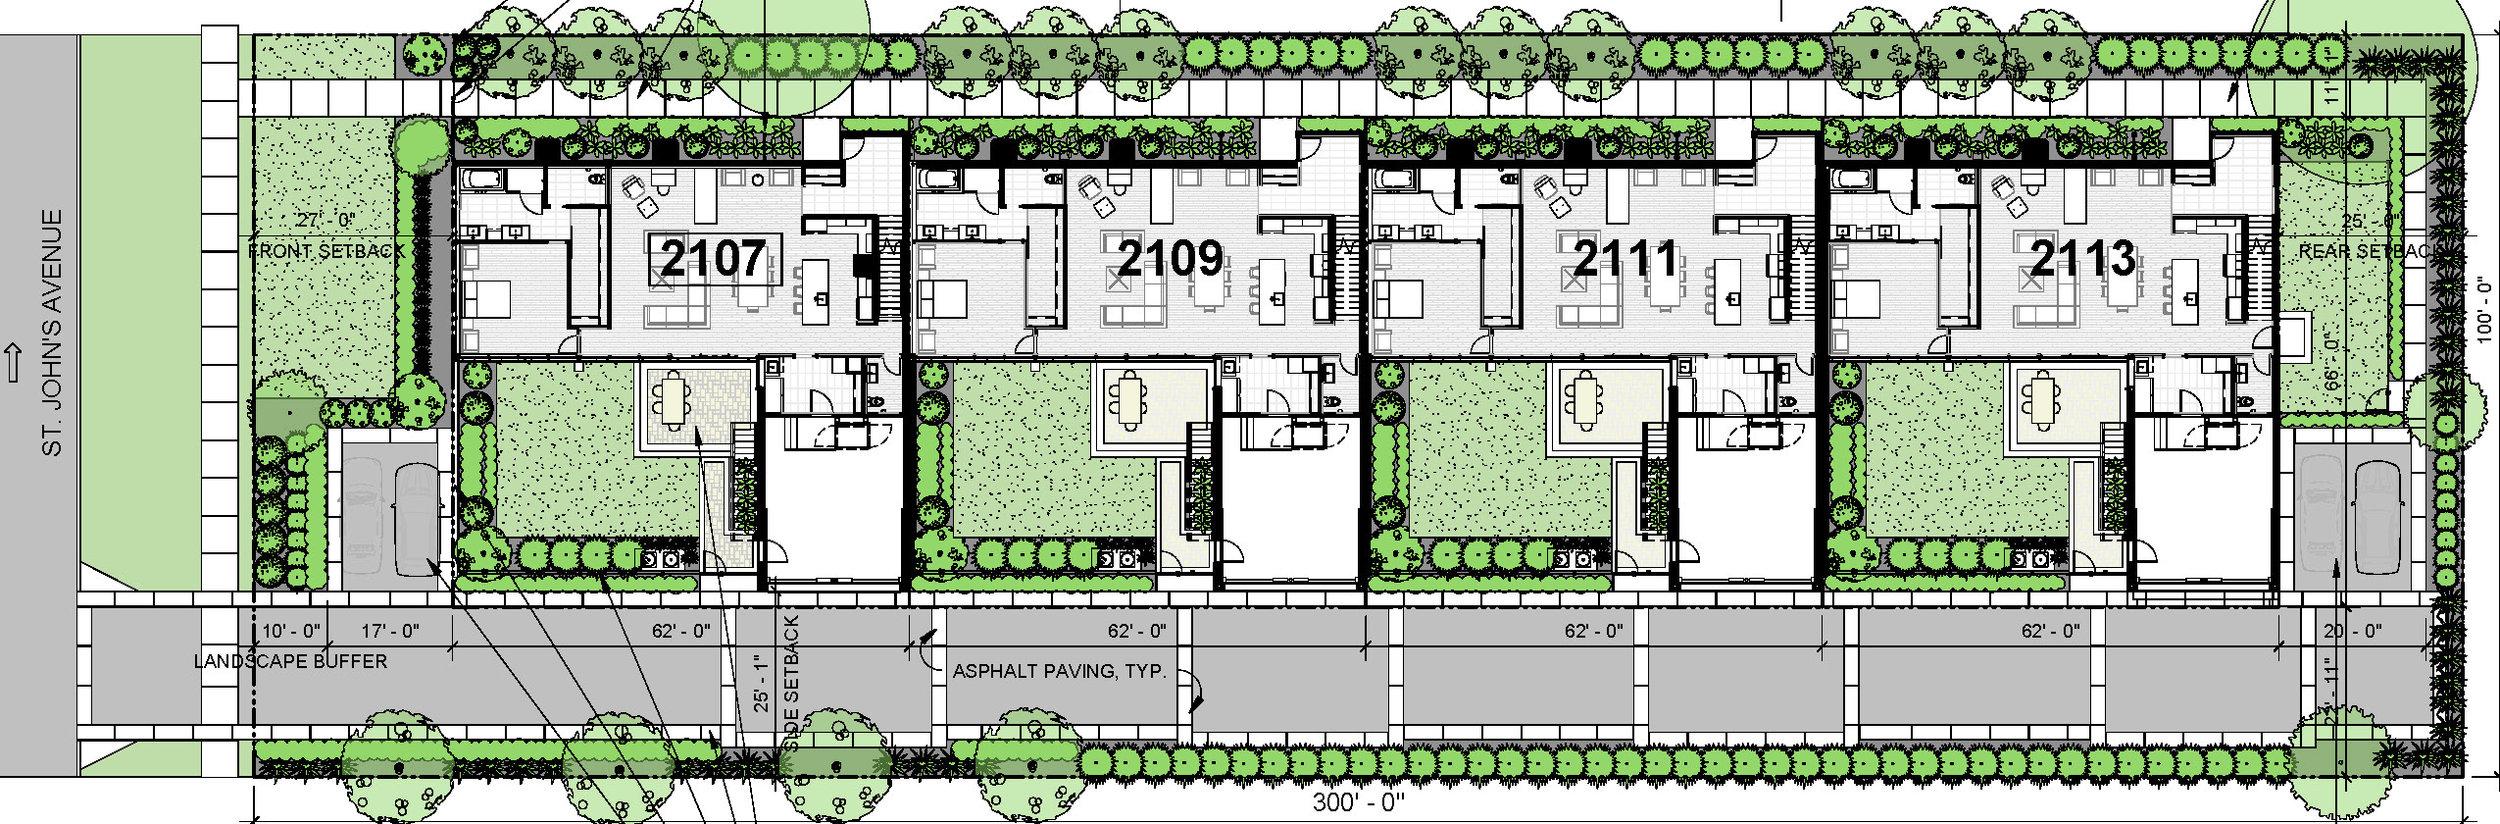 HP Modern - Site Plan